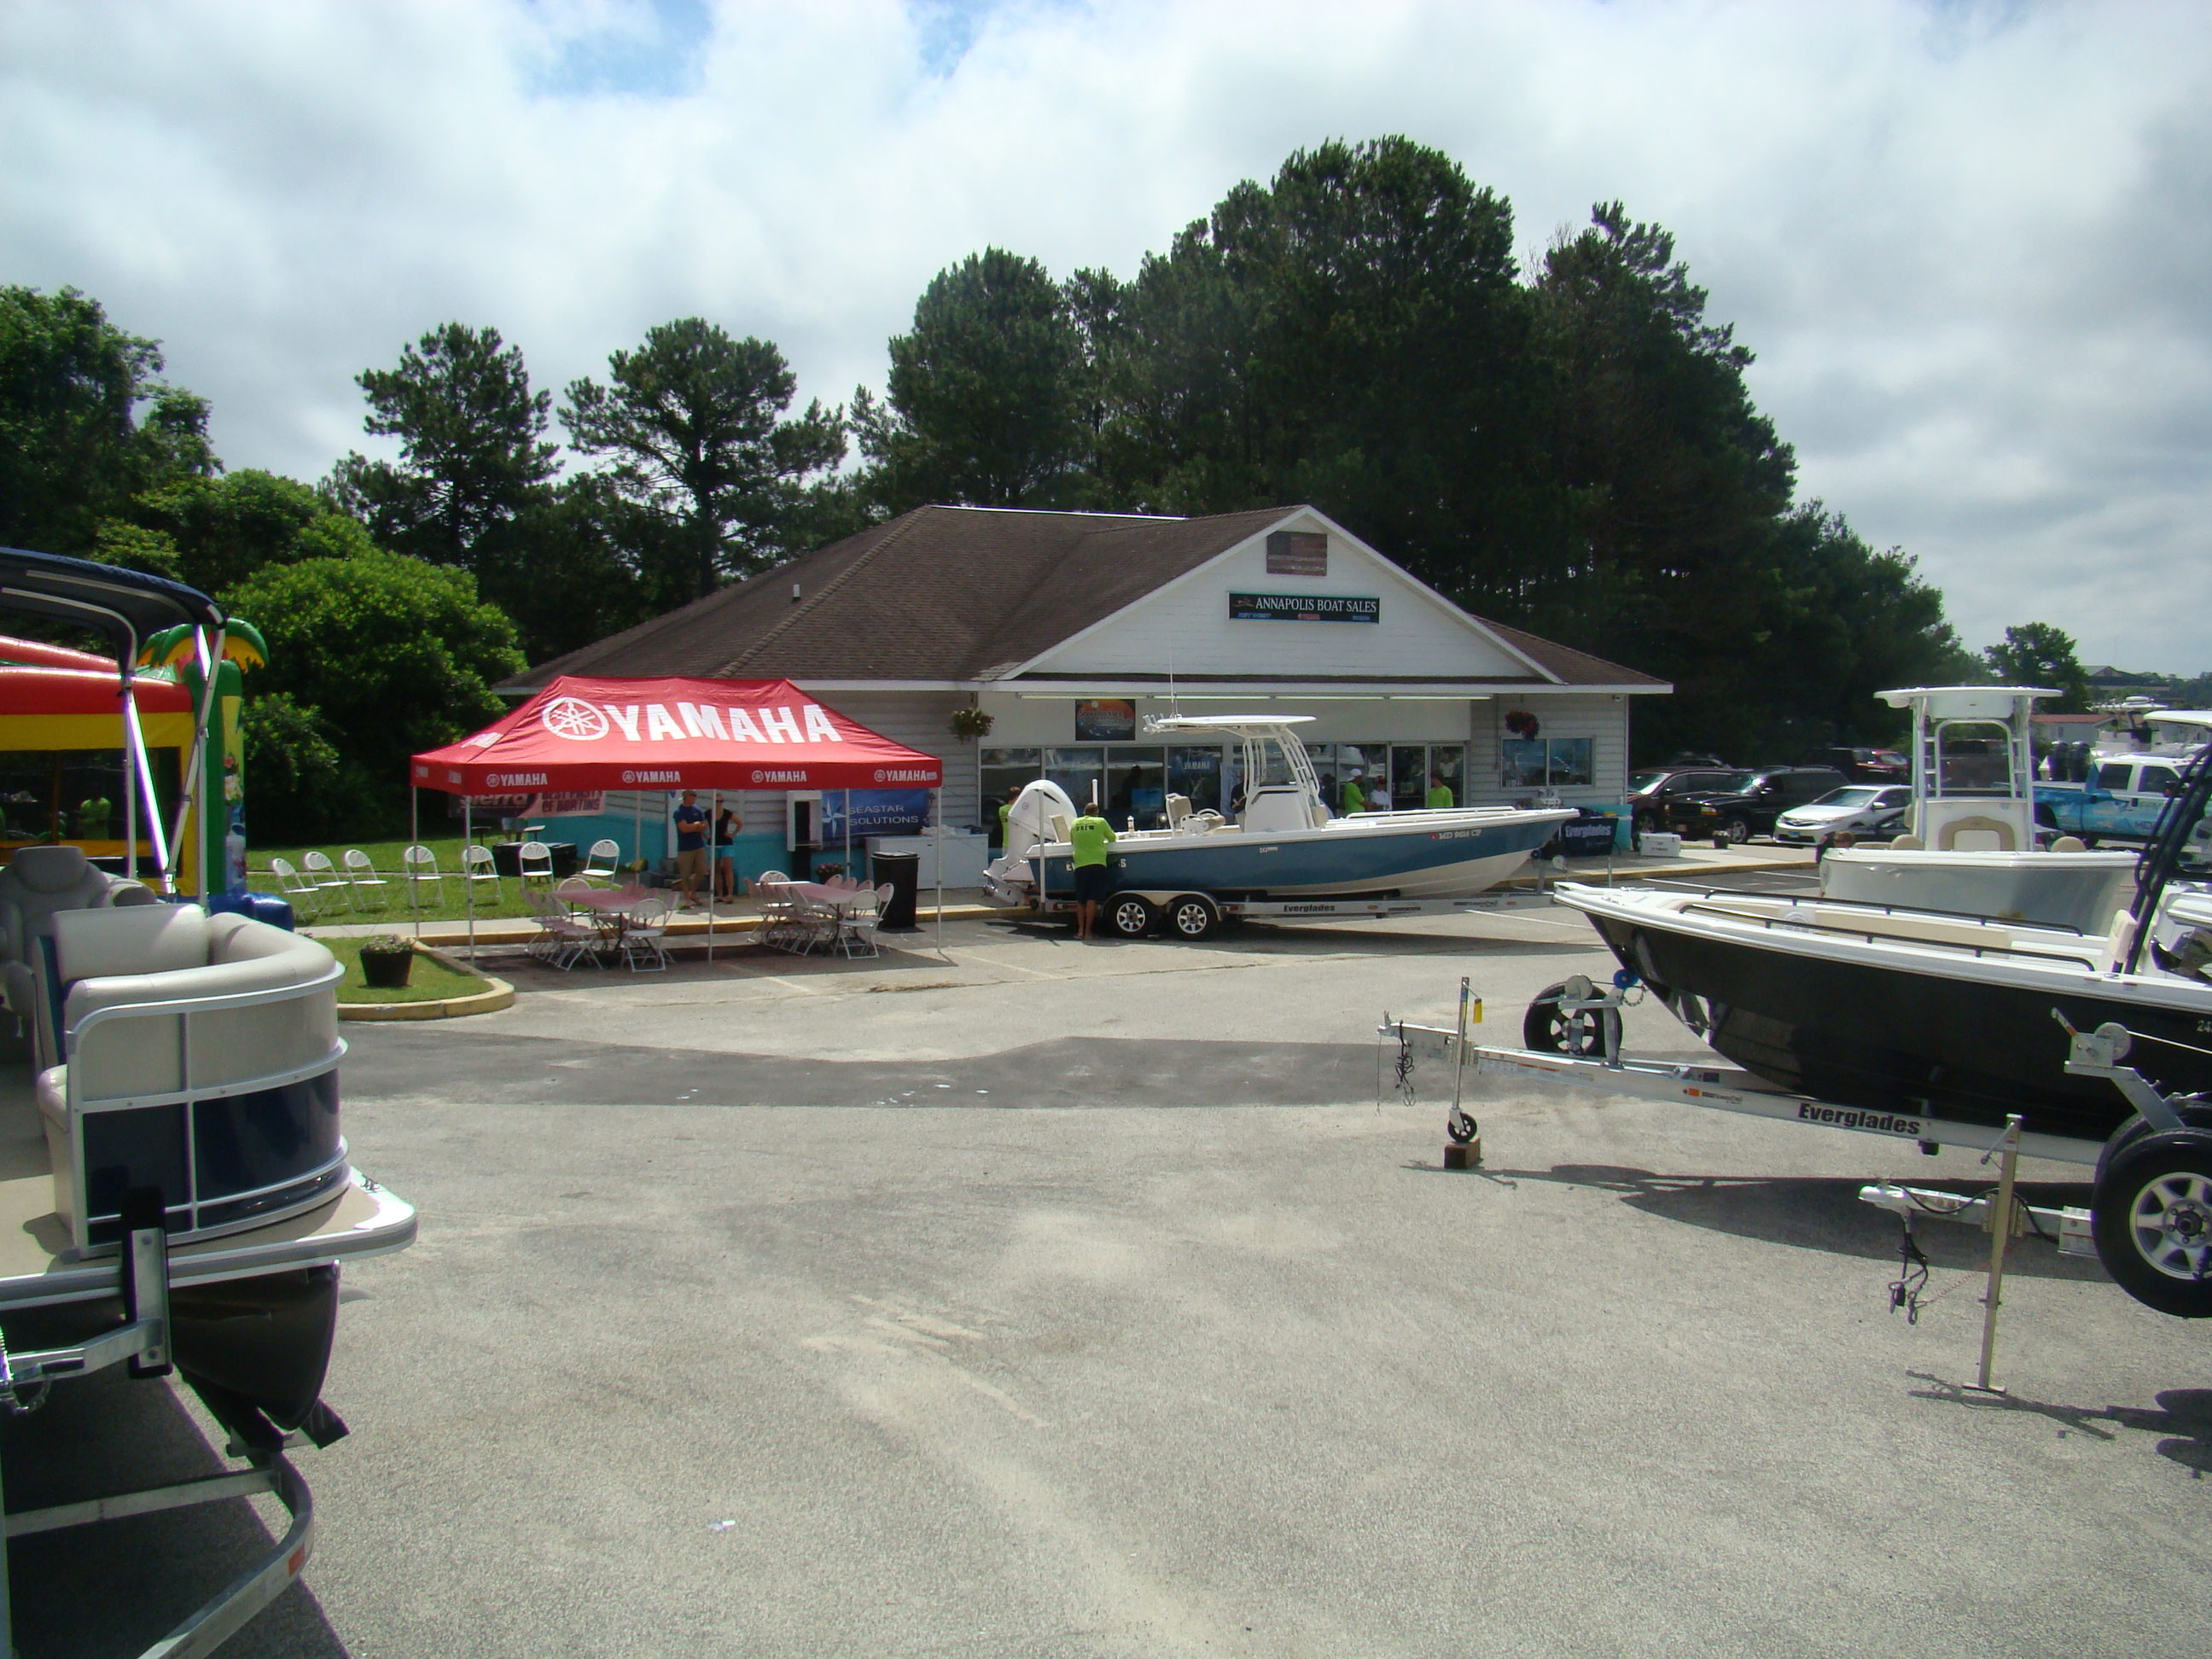 Annapolis Boat Sales LLC image 2